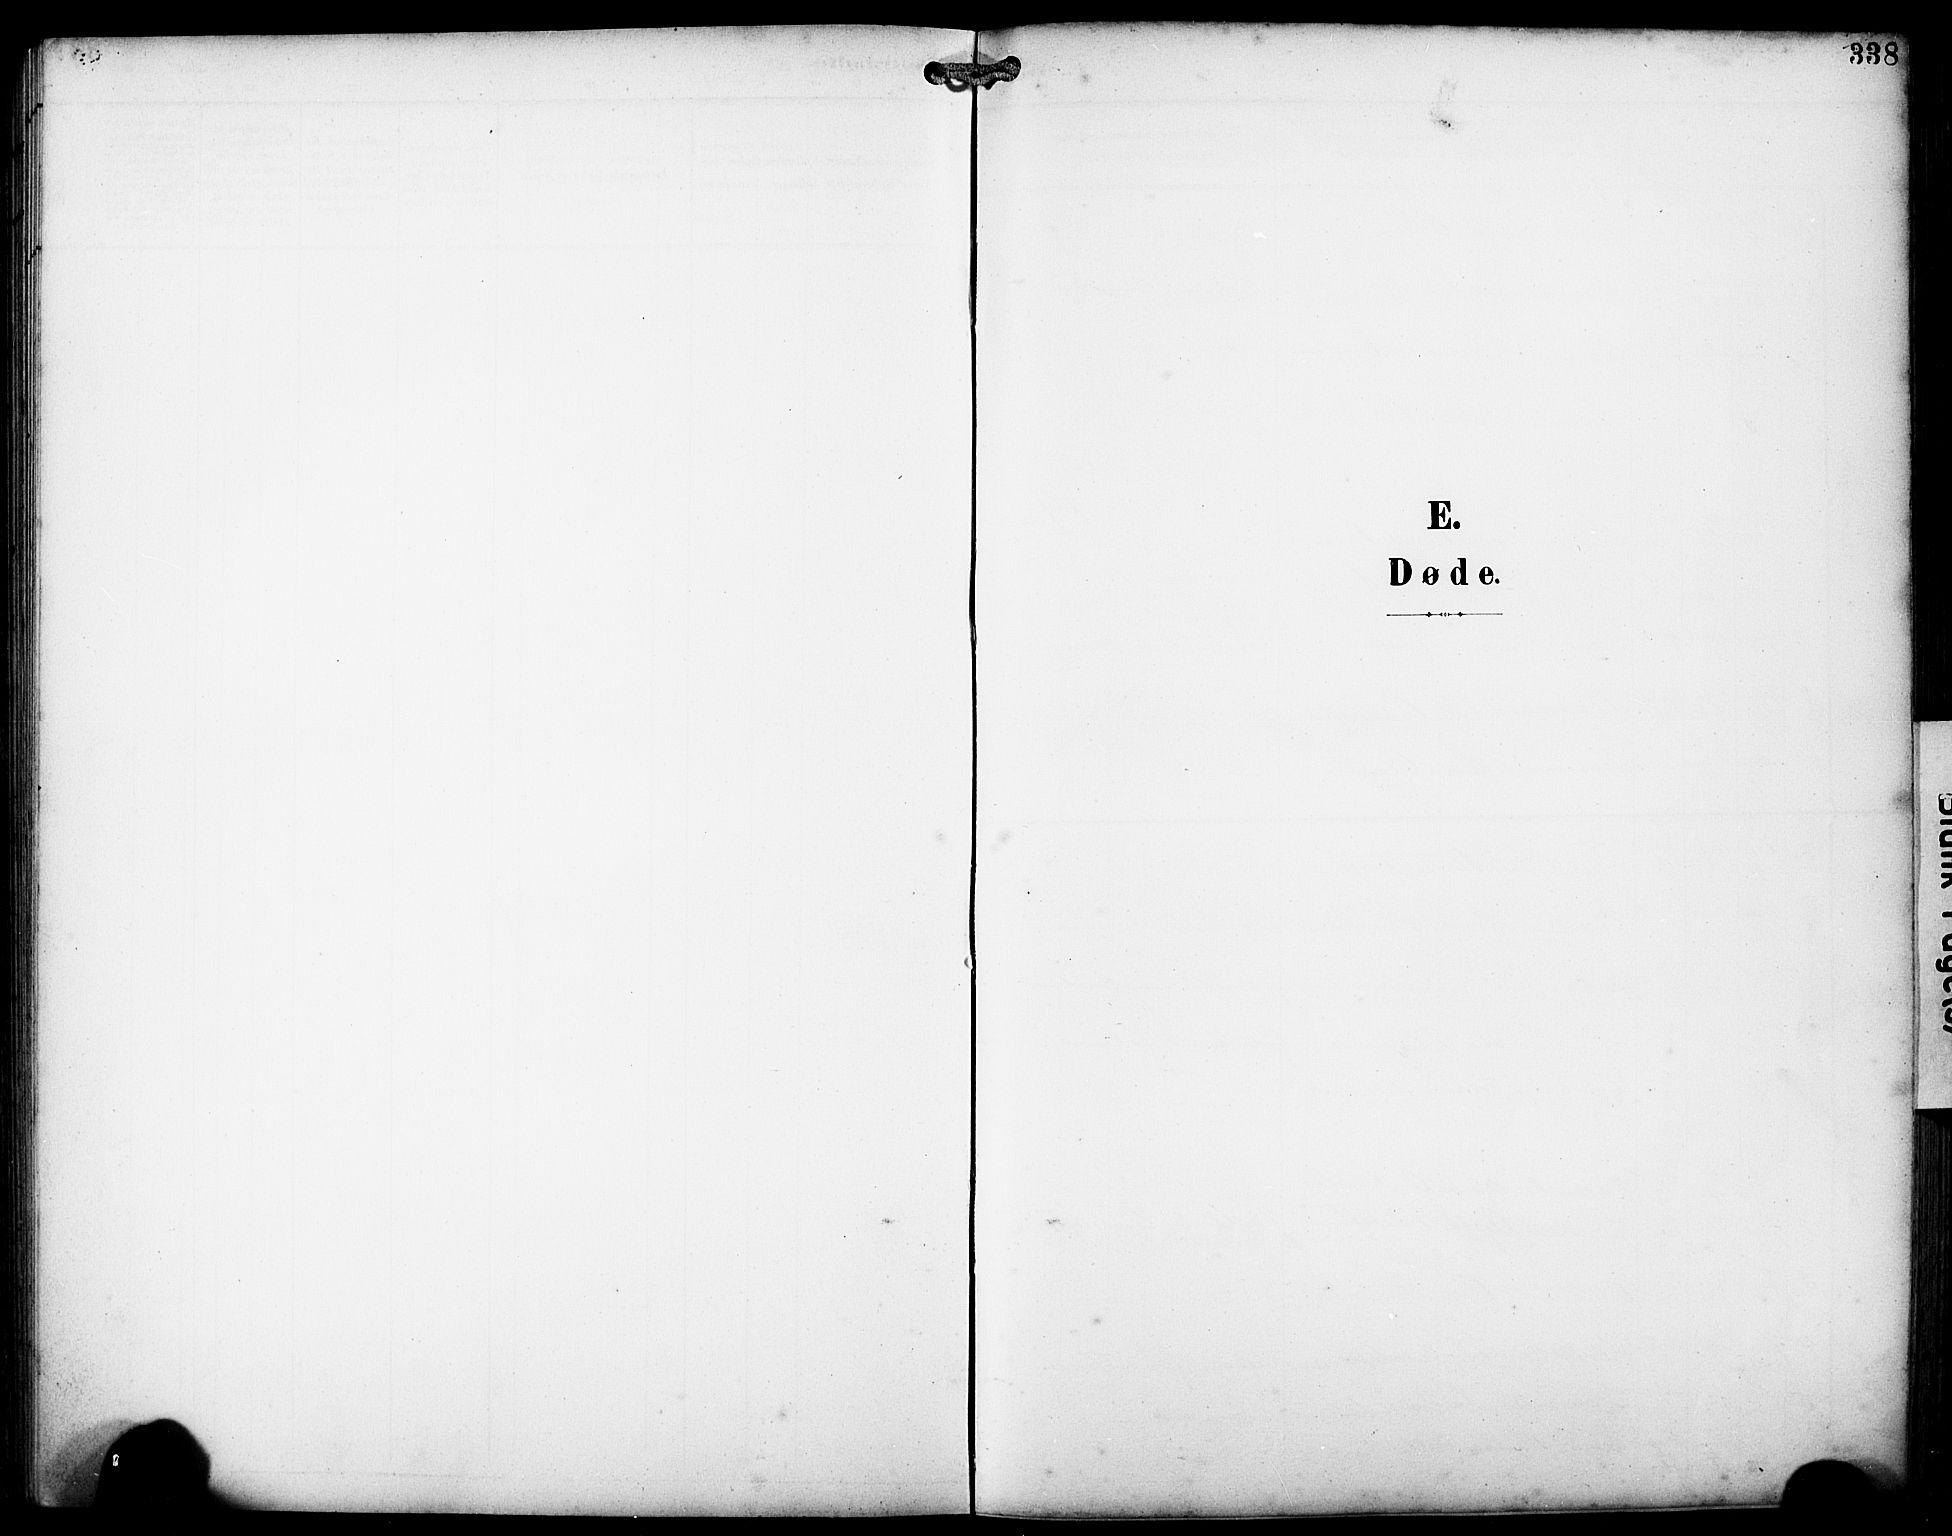 SAB, Fjell sokneprestembete, H/Hab: Klokkerbok nr. A 5, 1899-1918, s. 338